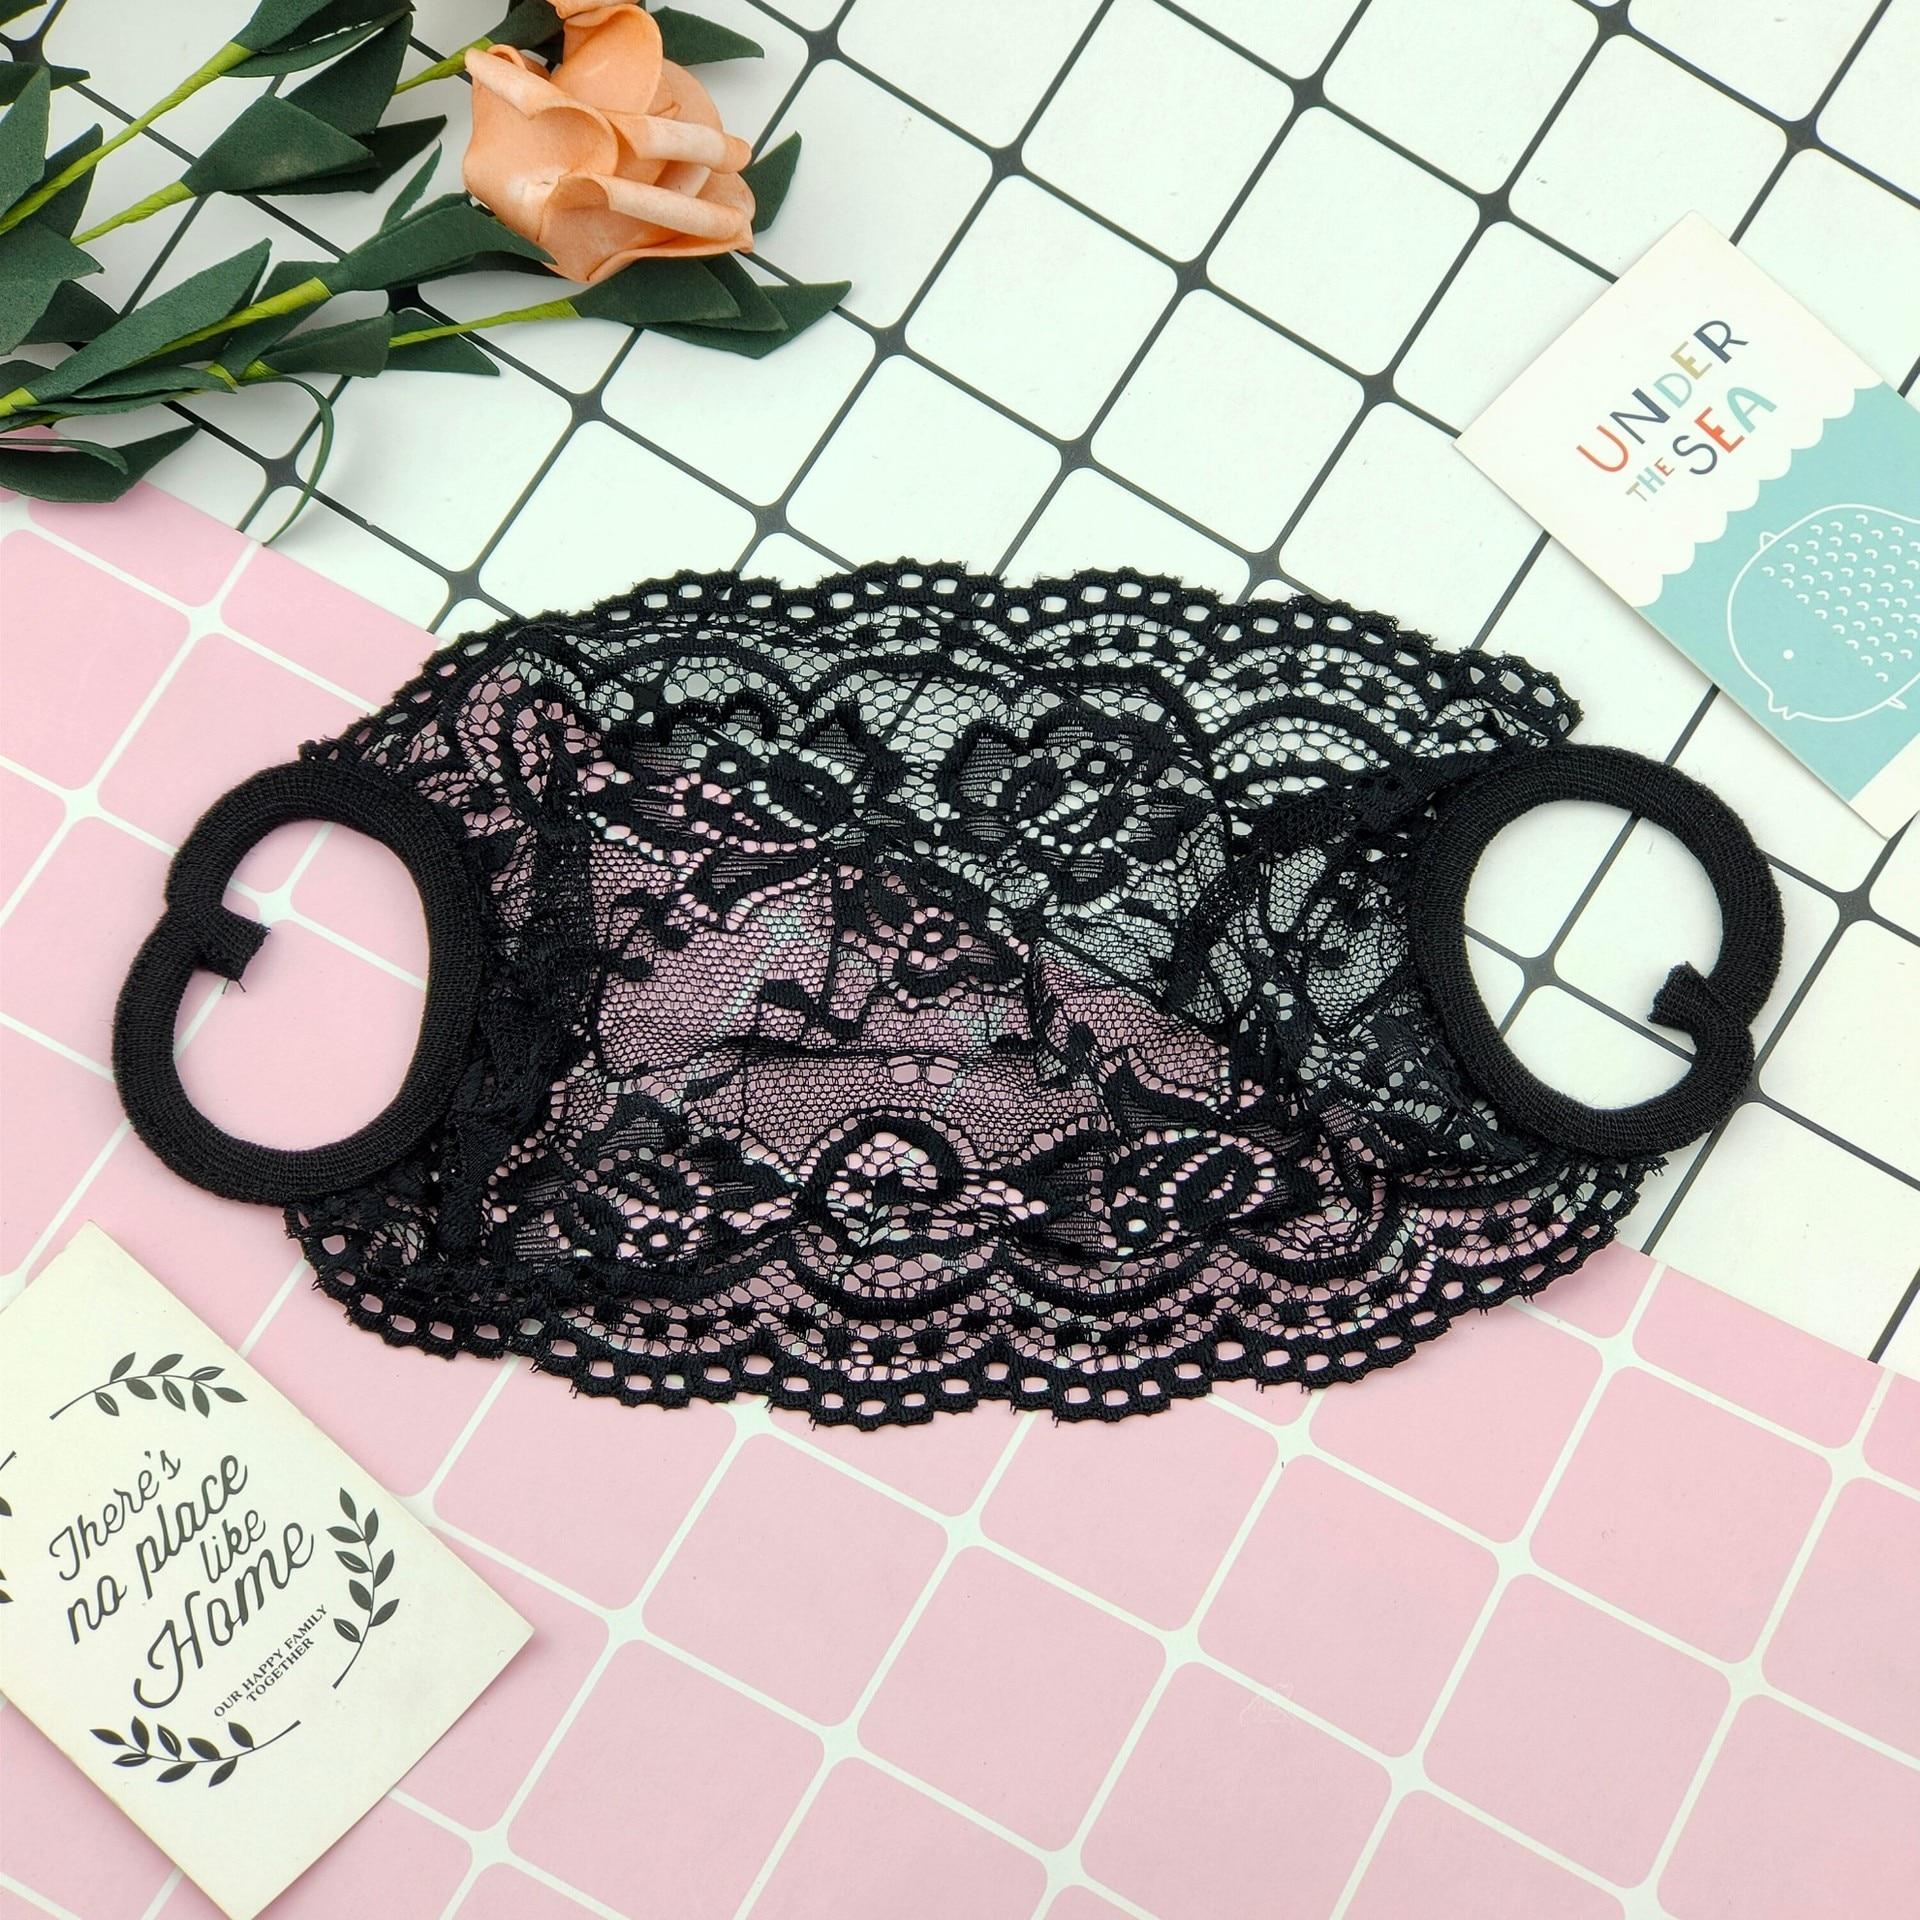 10pcs/lot Fashion Mouth Face Lace Flower Pattern Black And White Mask Unique Mask